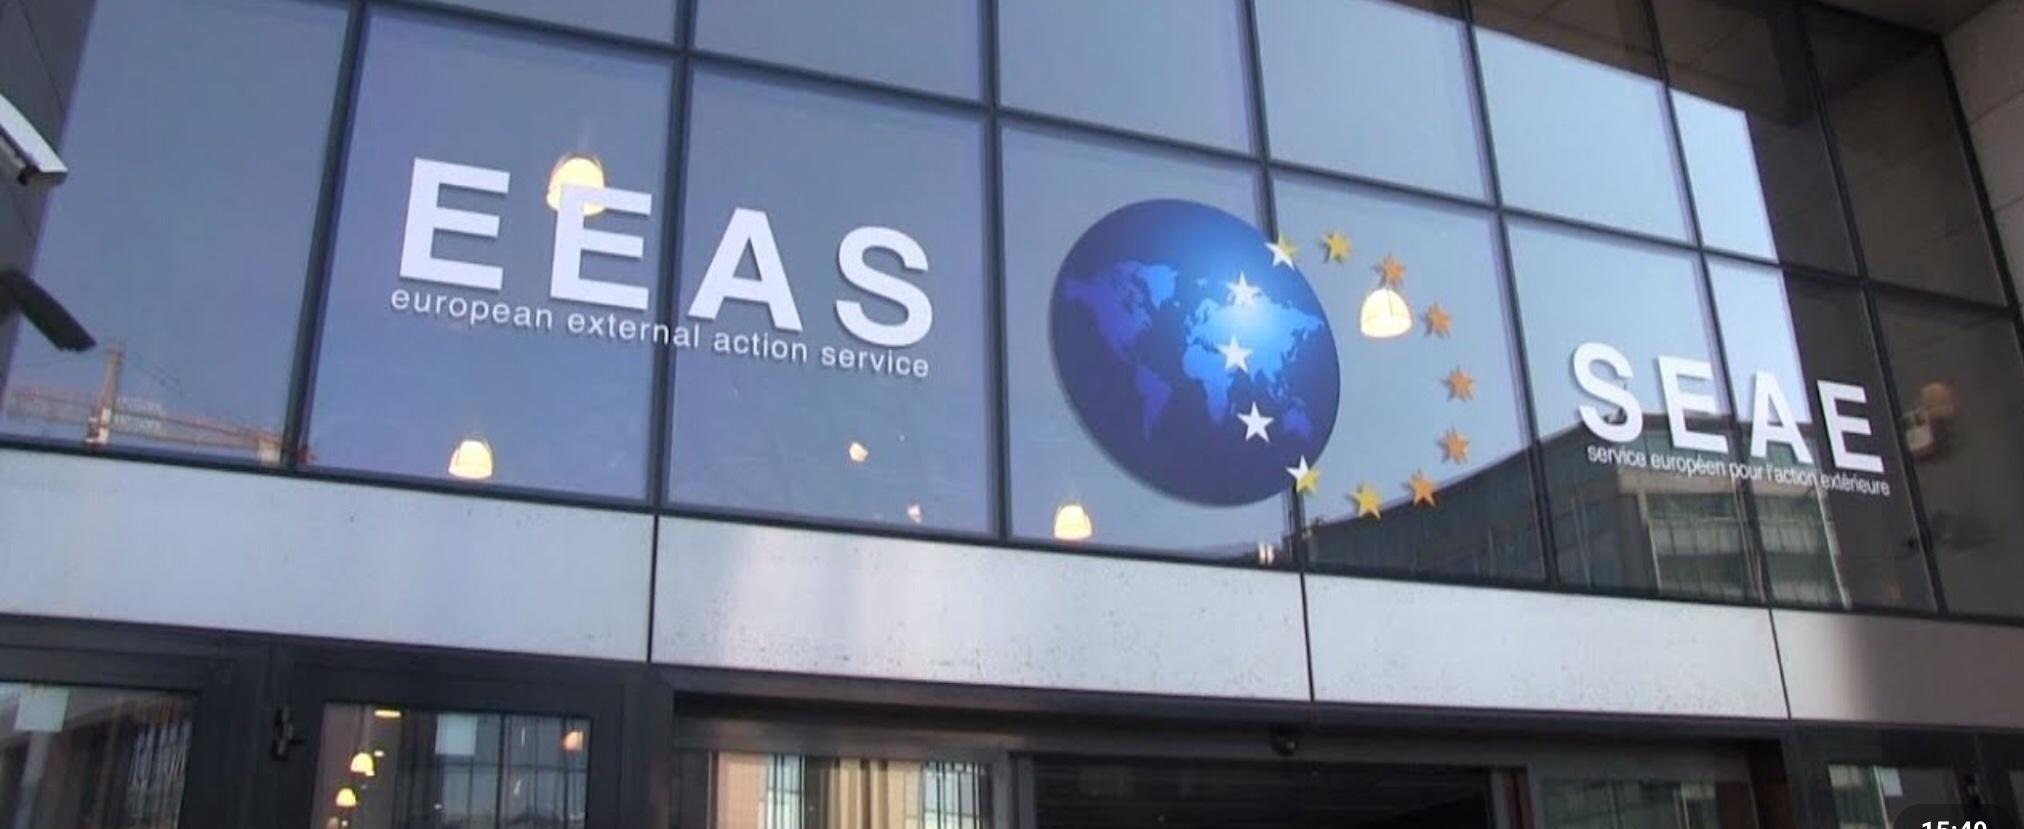 N.Karabach: EU calls to observe ceasefire